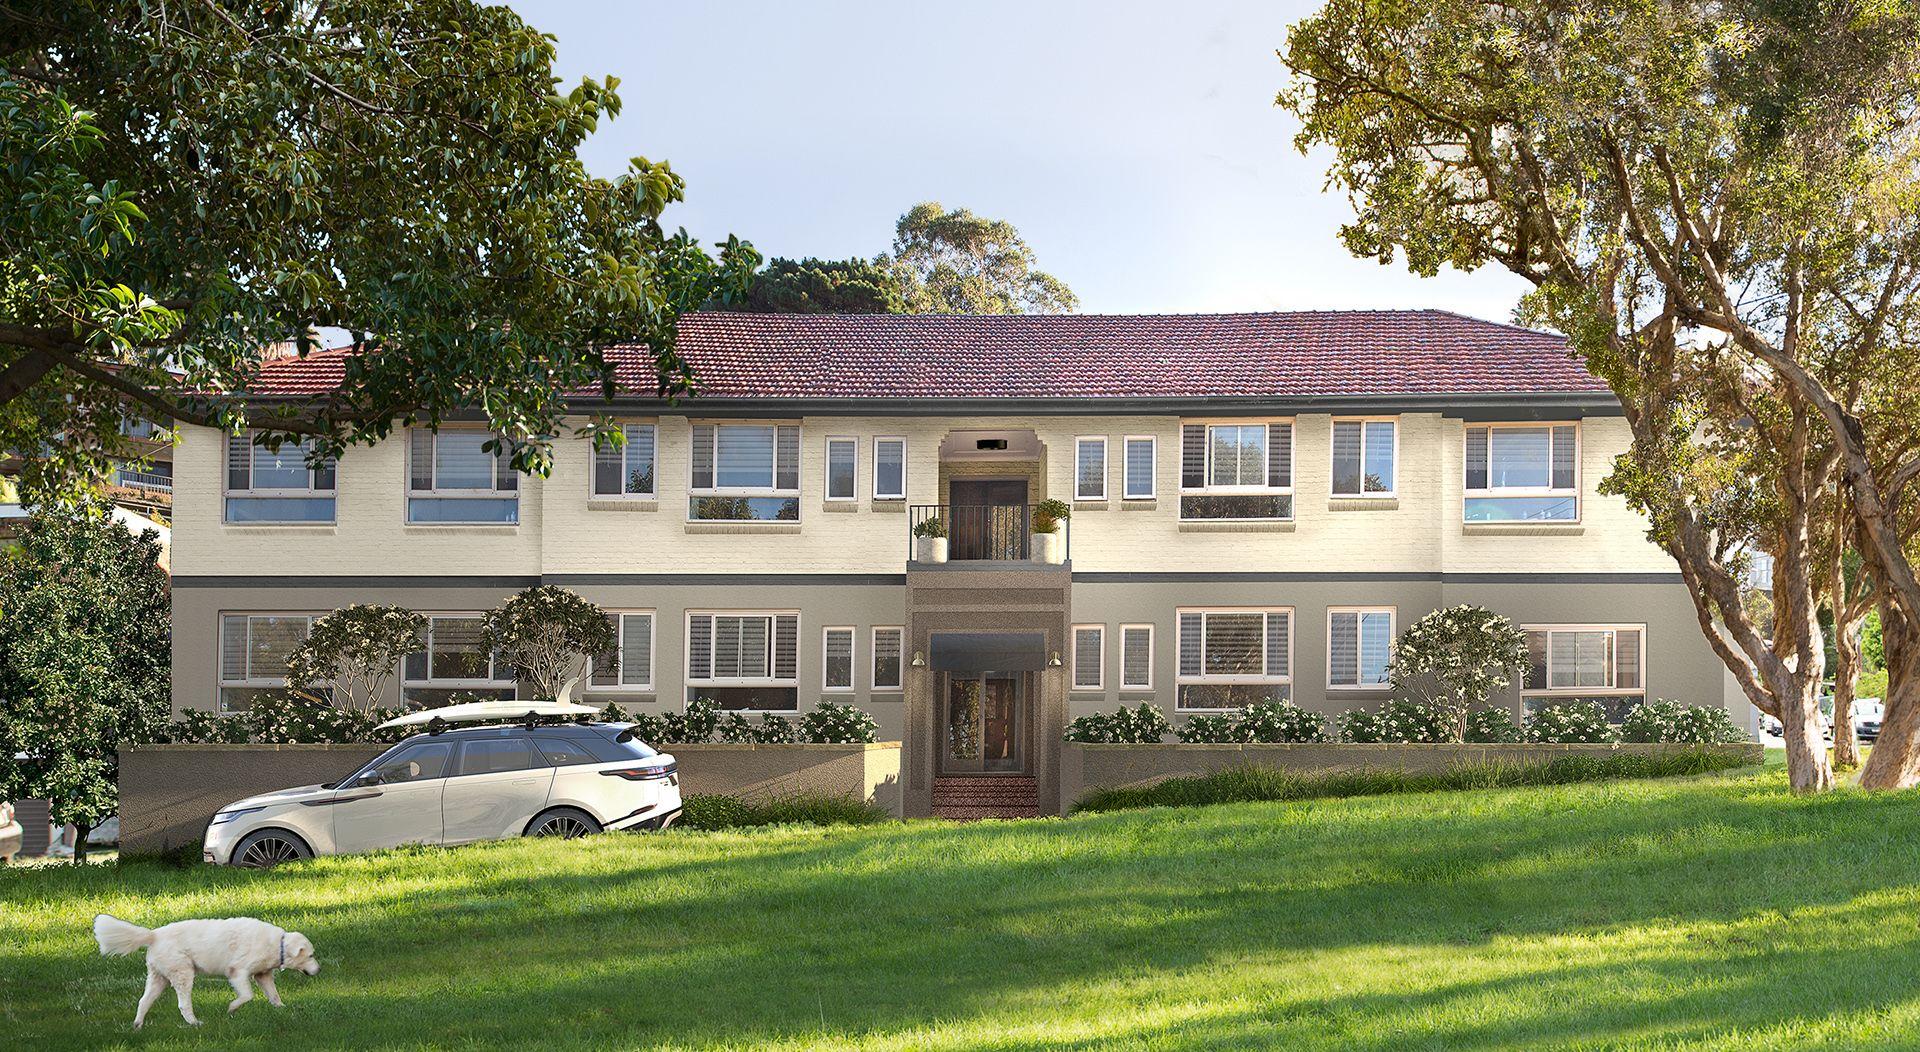 5/64 Brown Street, Bronte NSW 2024, Image 0